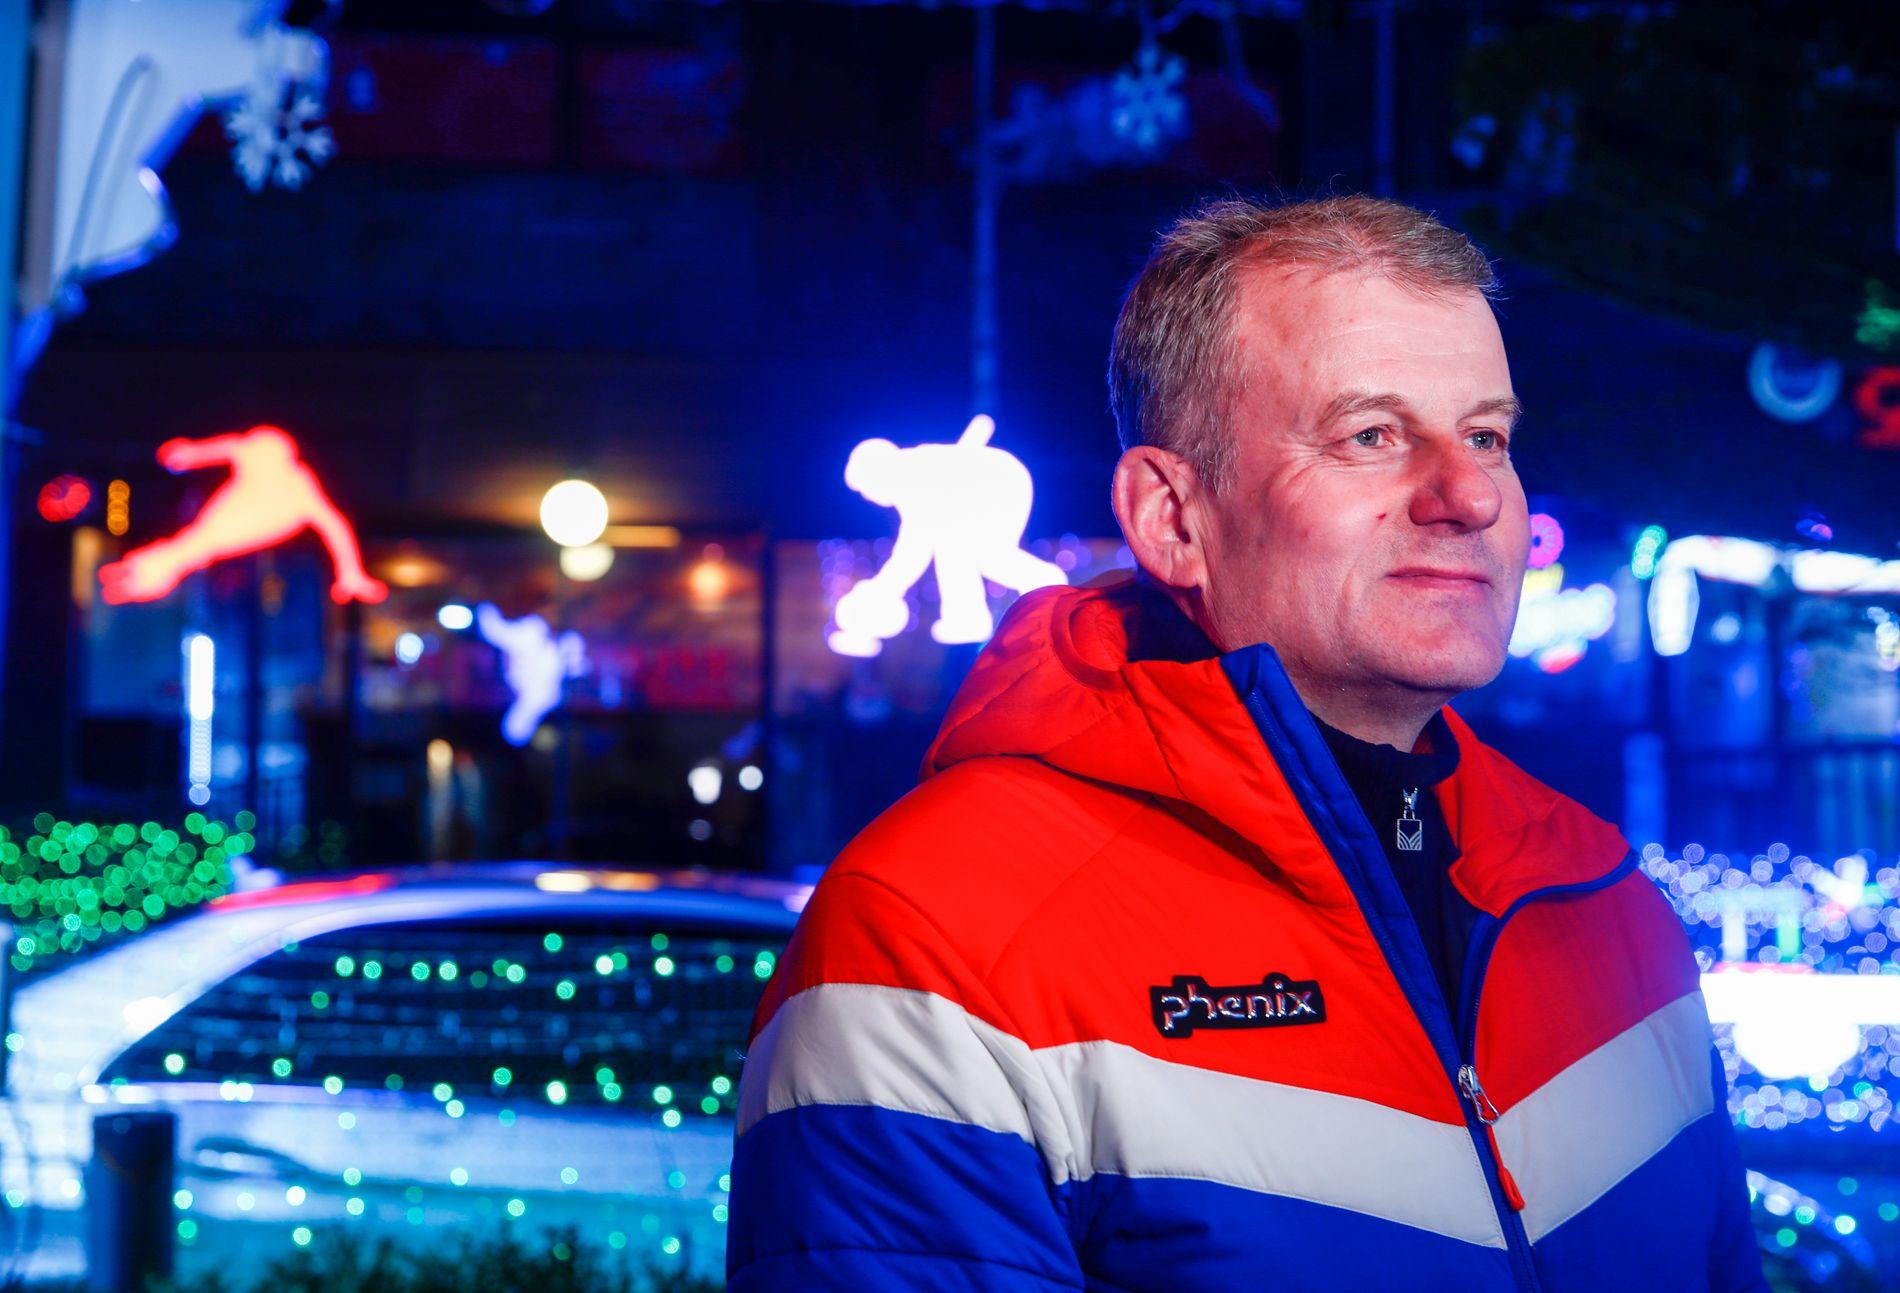 UENIG I VALGET: Erik Røste stemte heller på Hong Kong, forteller han i dette intervjuet med VG.